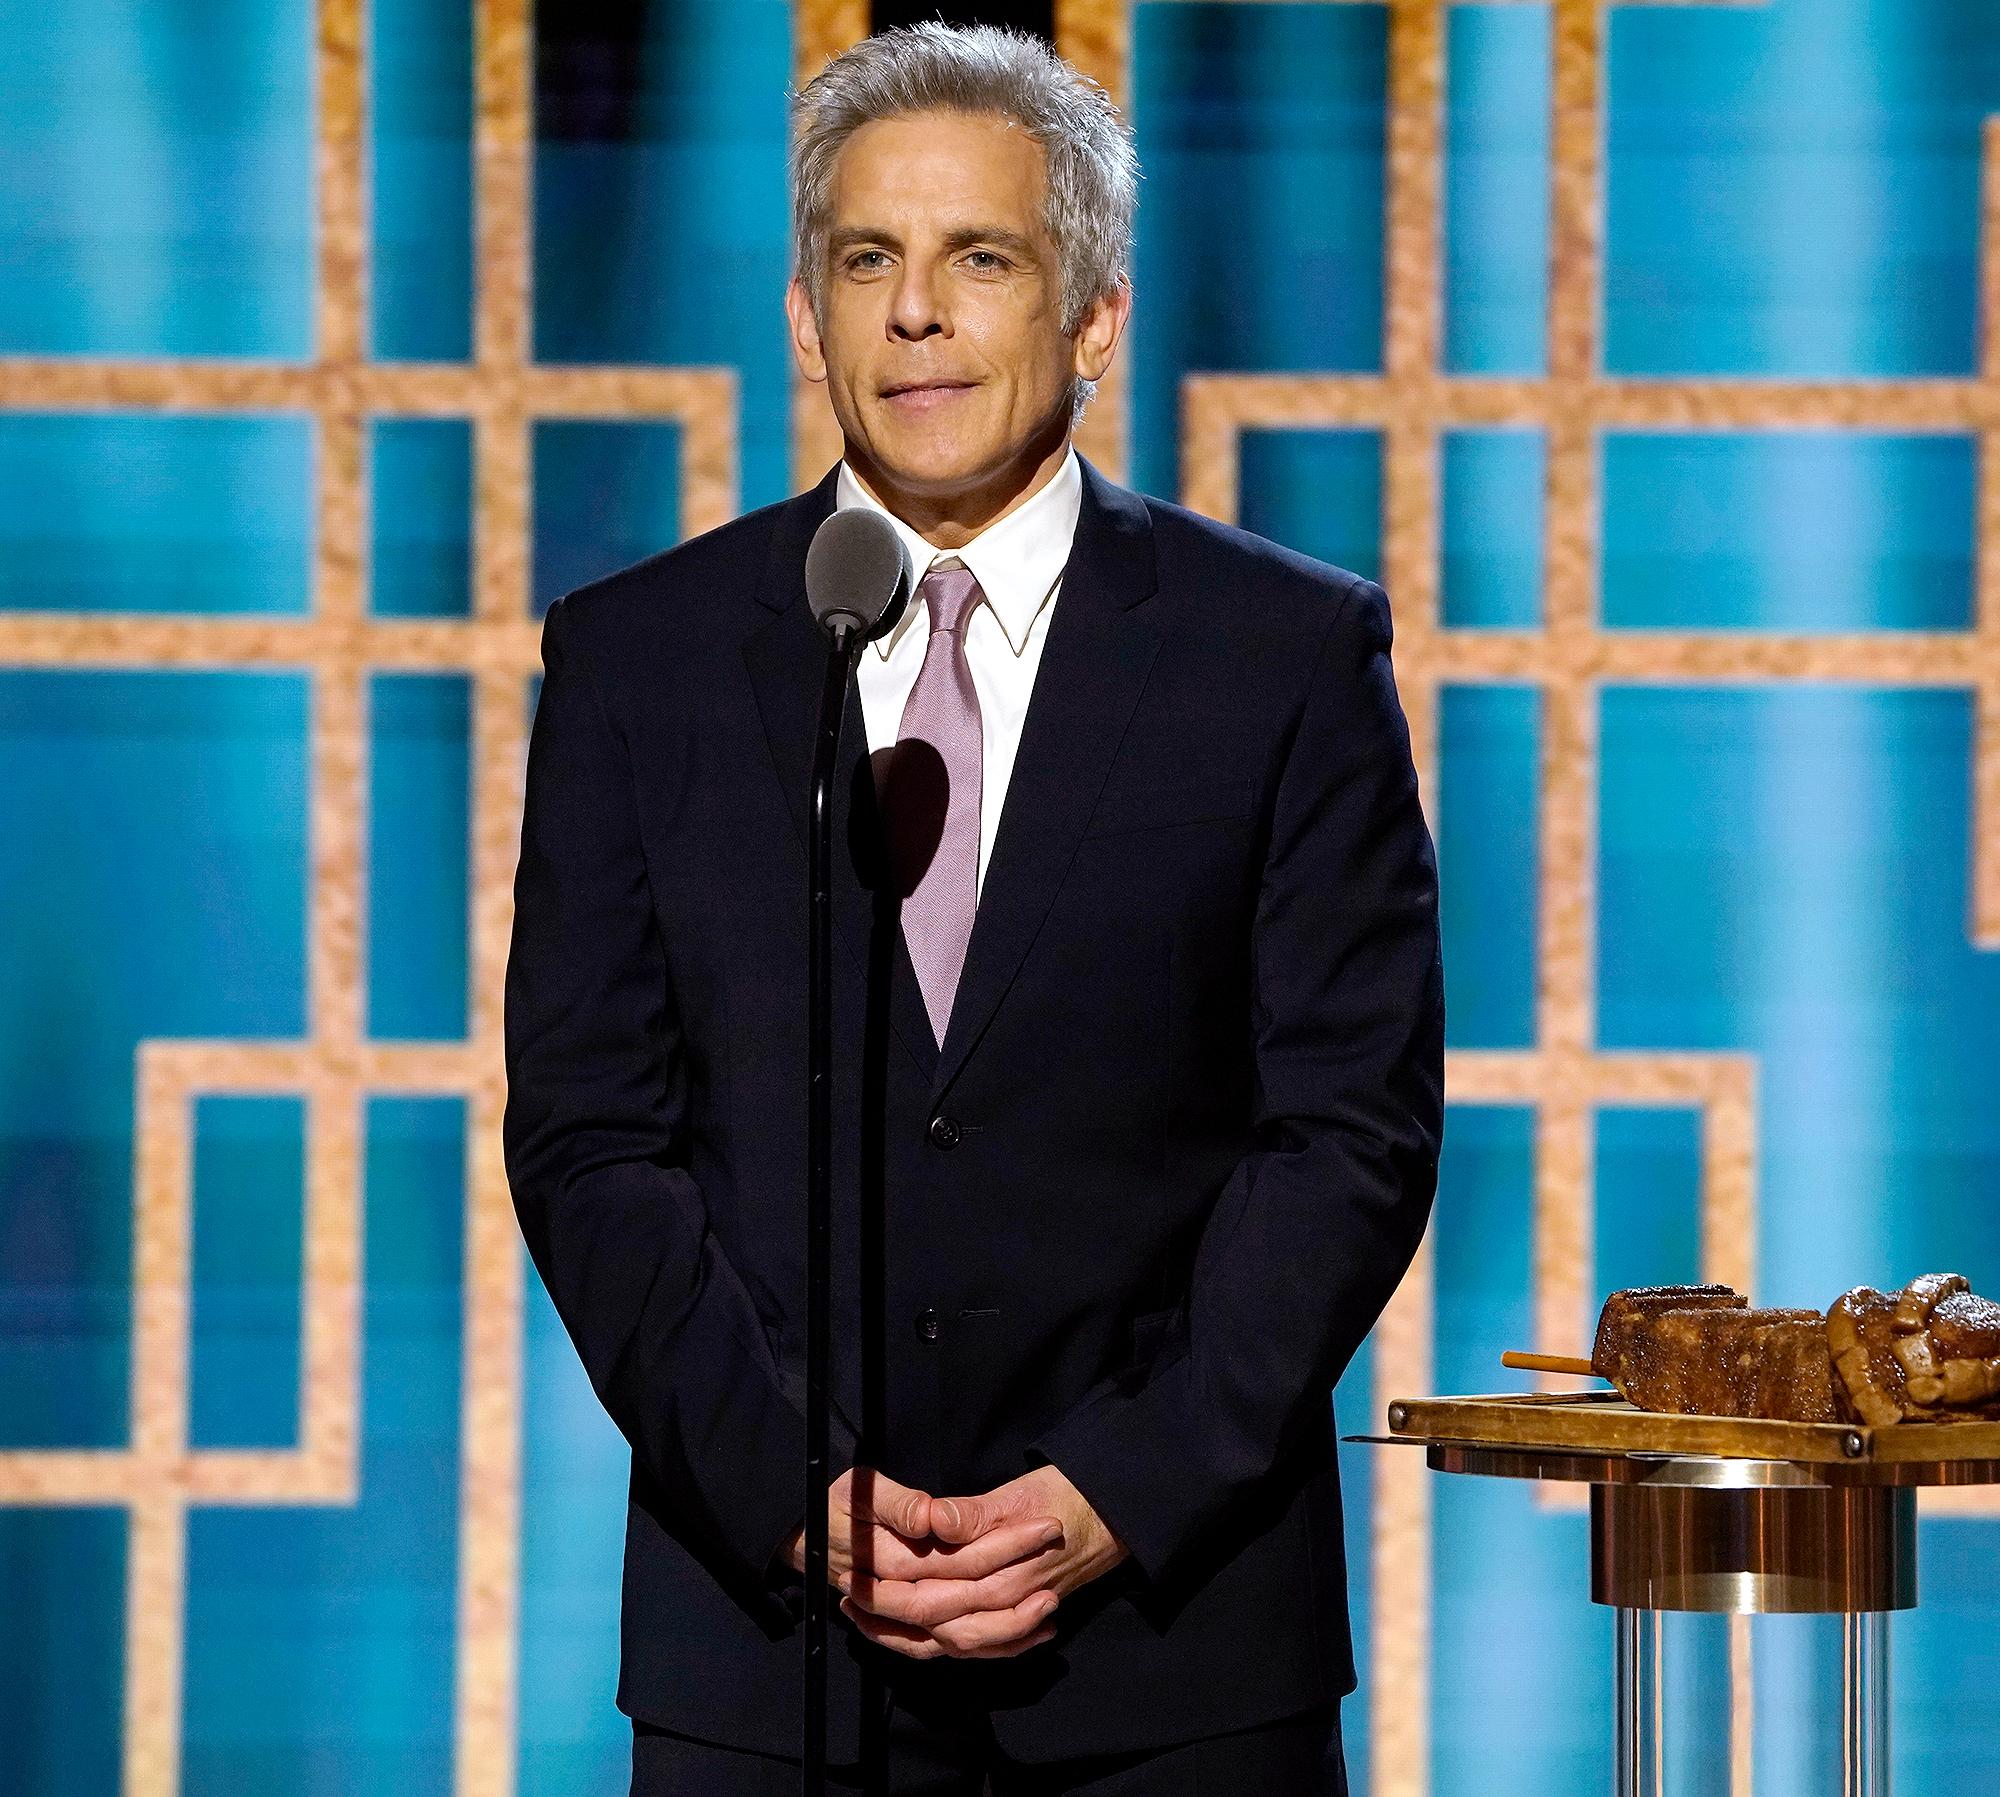 Silver Fox! Ben Stiller Jokes About Dyeing His Hair Gray at Golden Globes